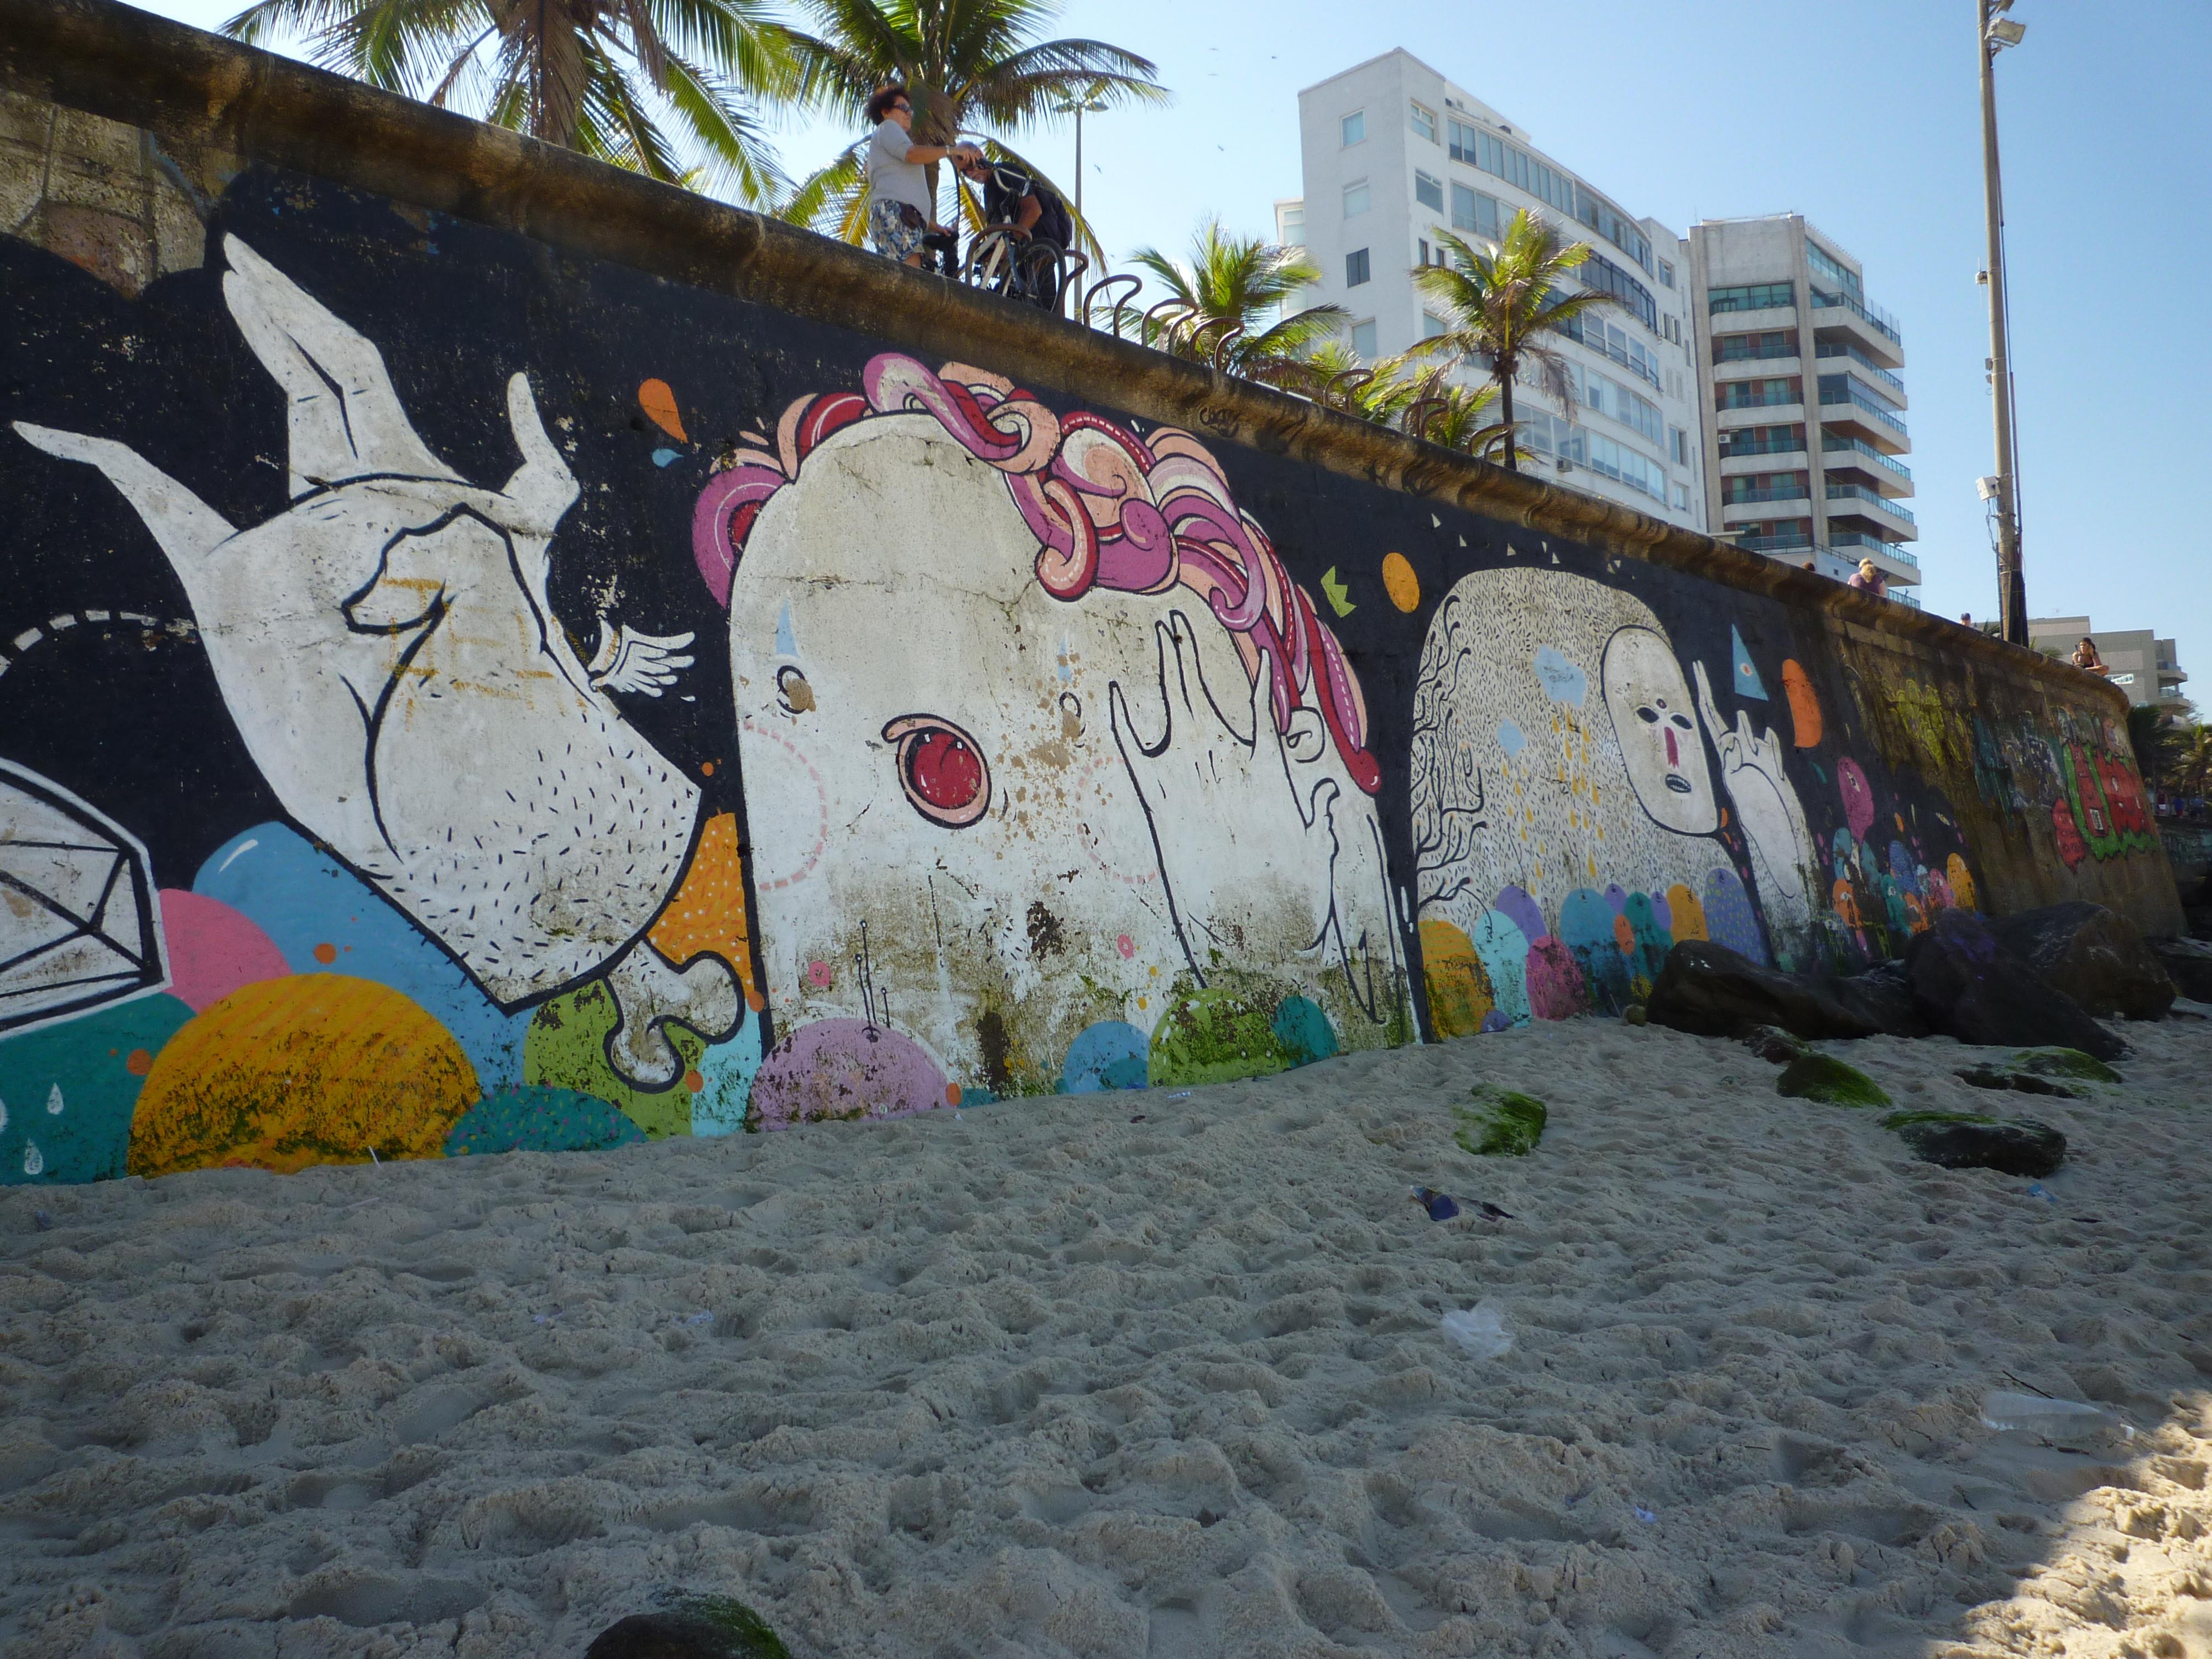 blu-grafite-italia-arte-urbana-donisio-arte (7)